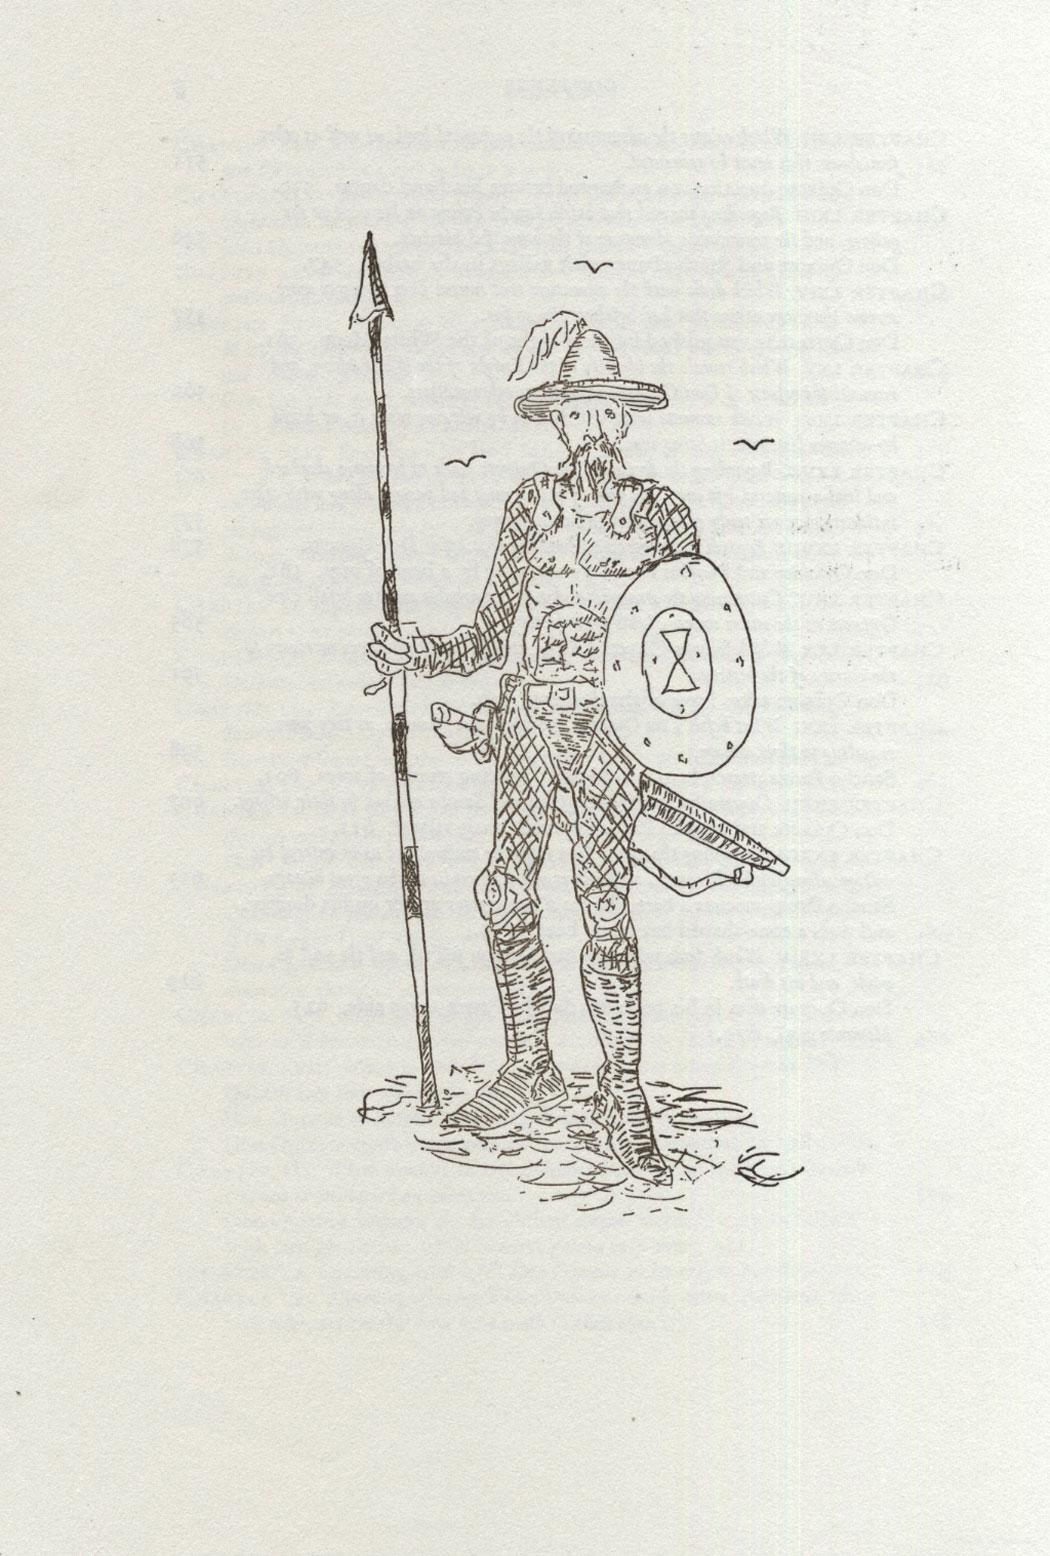 p.-10-figure.jpg